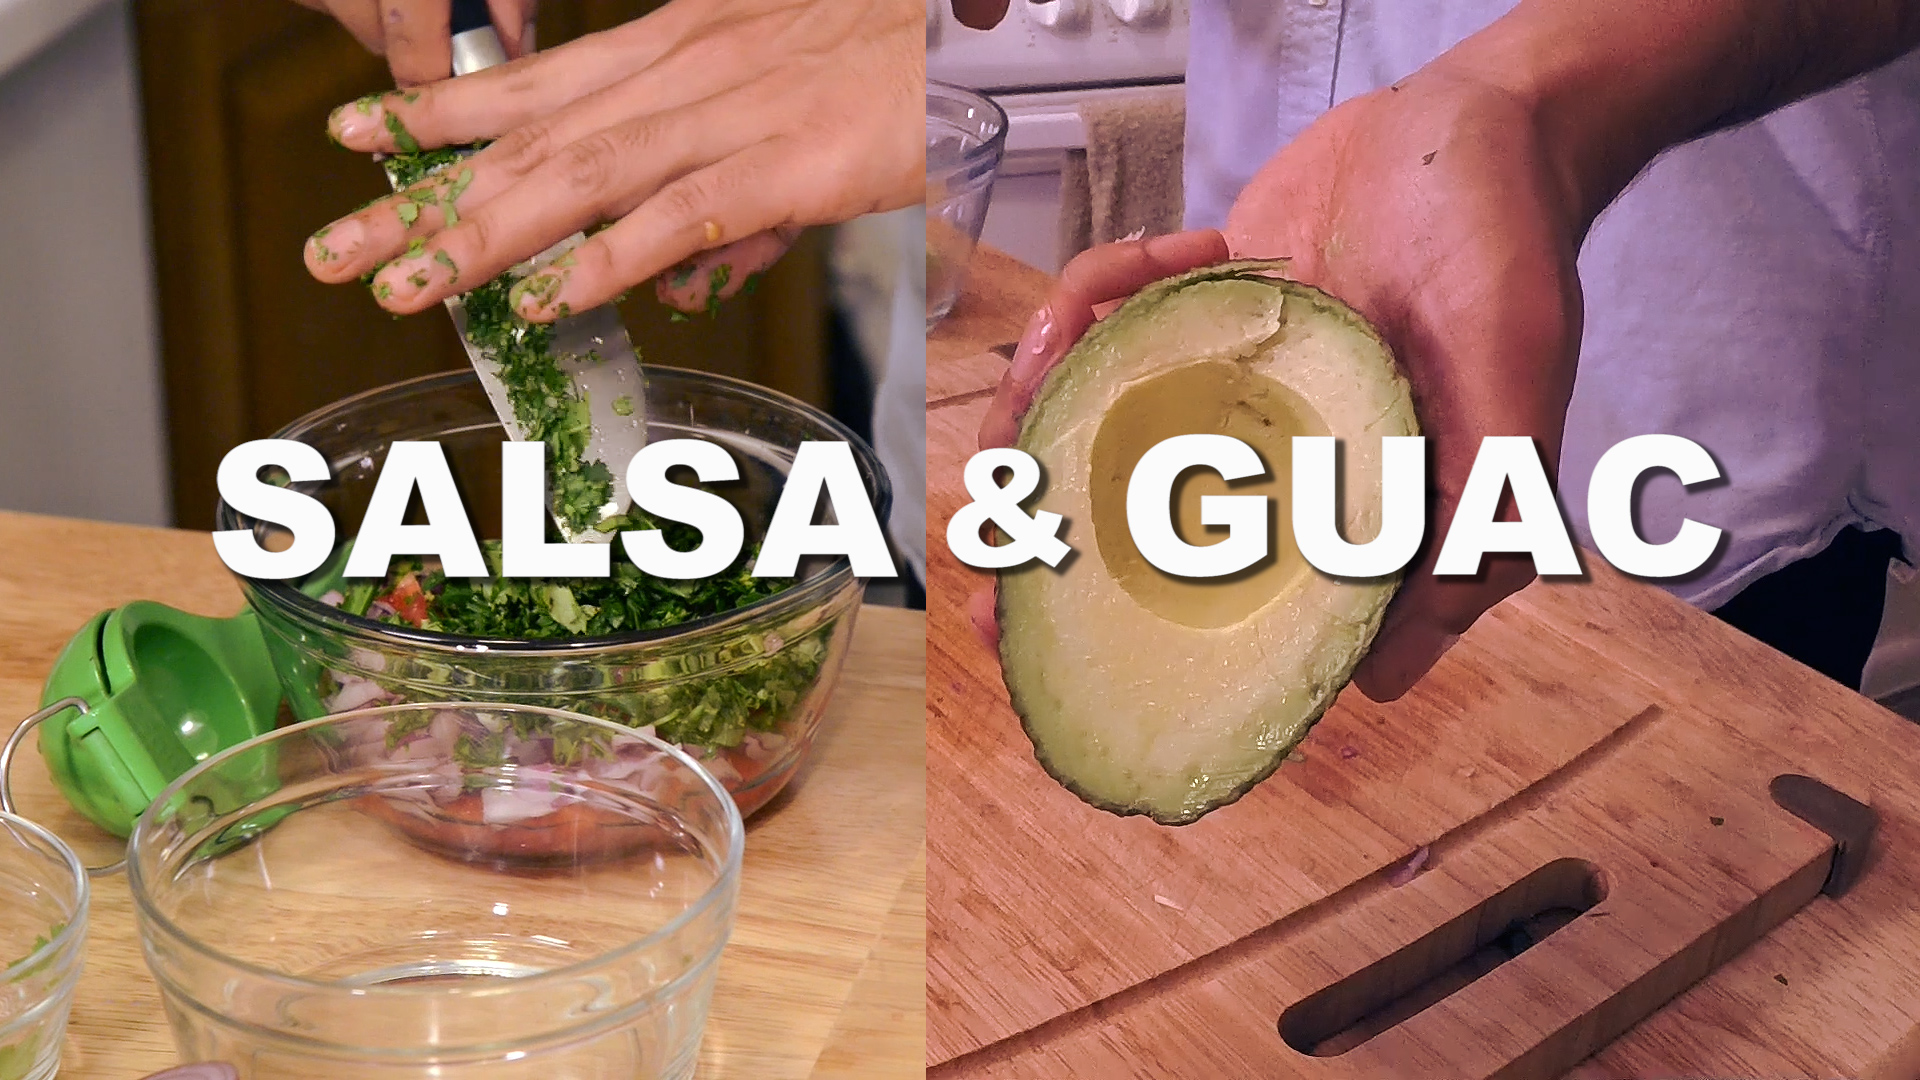 WORLD'S BEST GUACAMOLE & SALSA